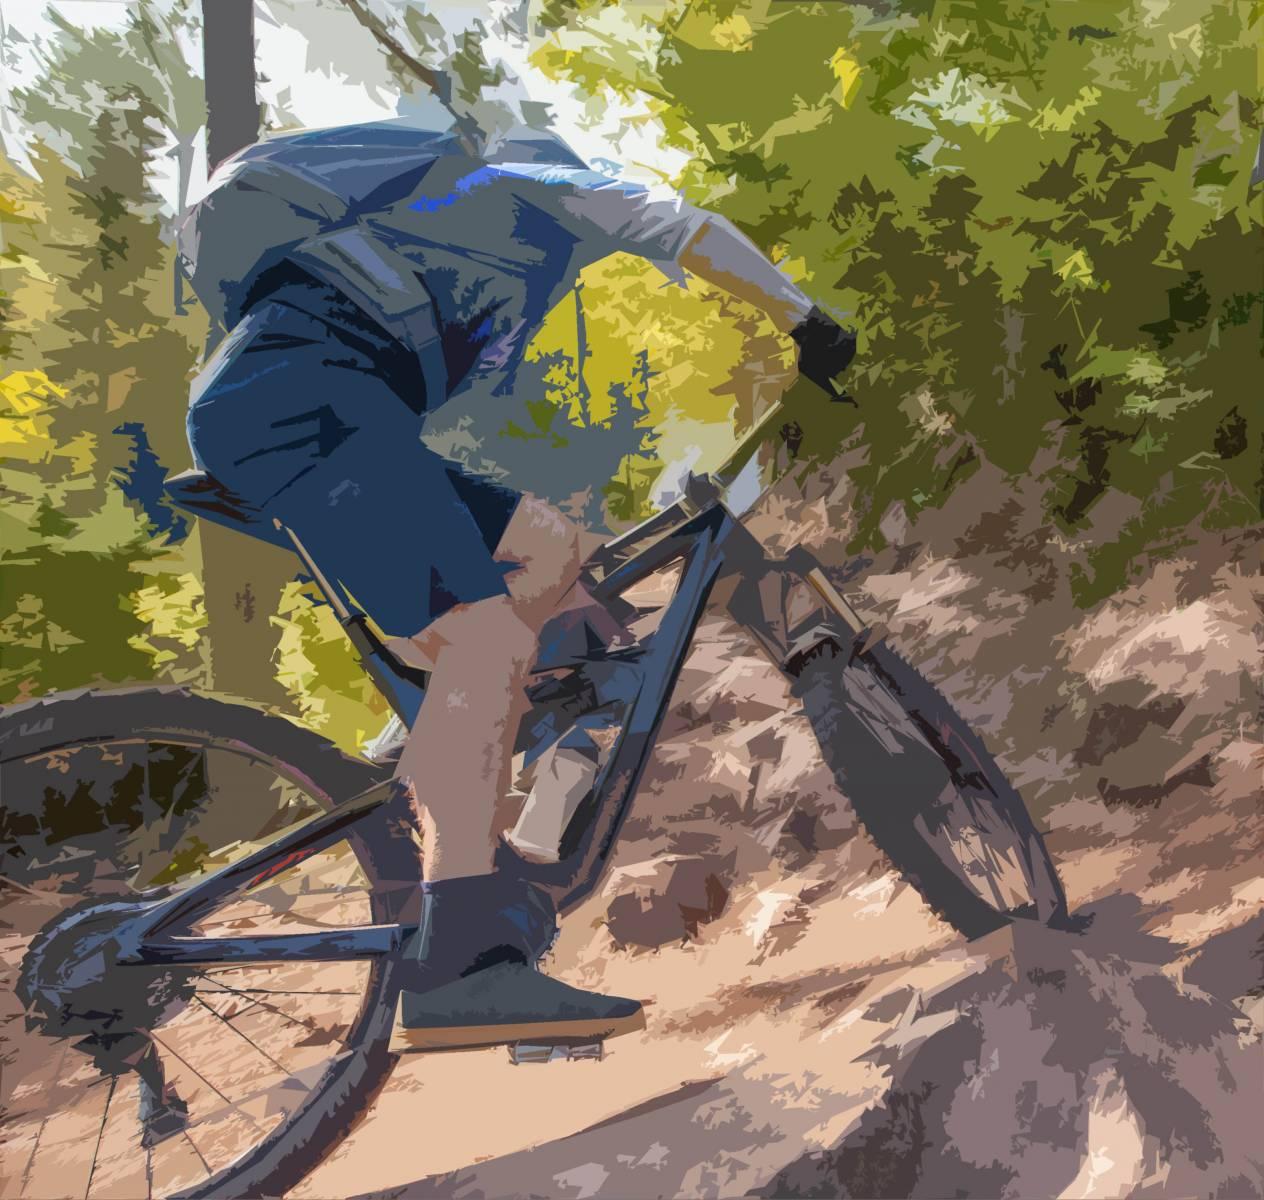 graphic image of mountain biker